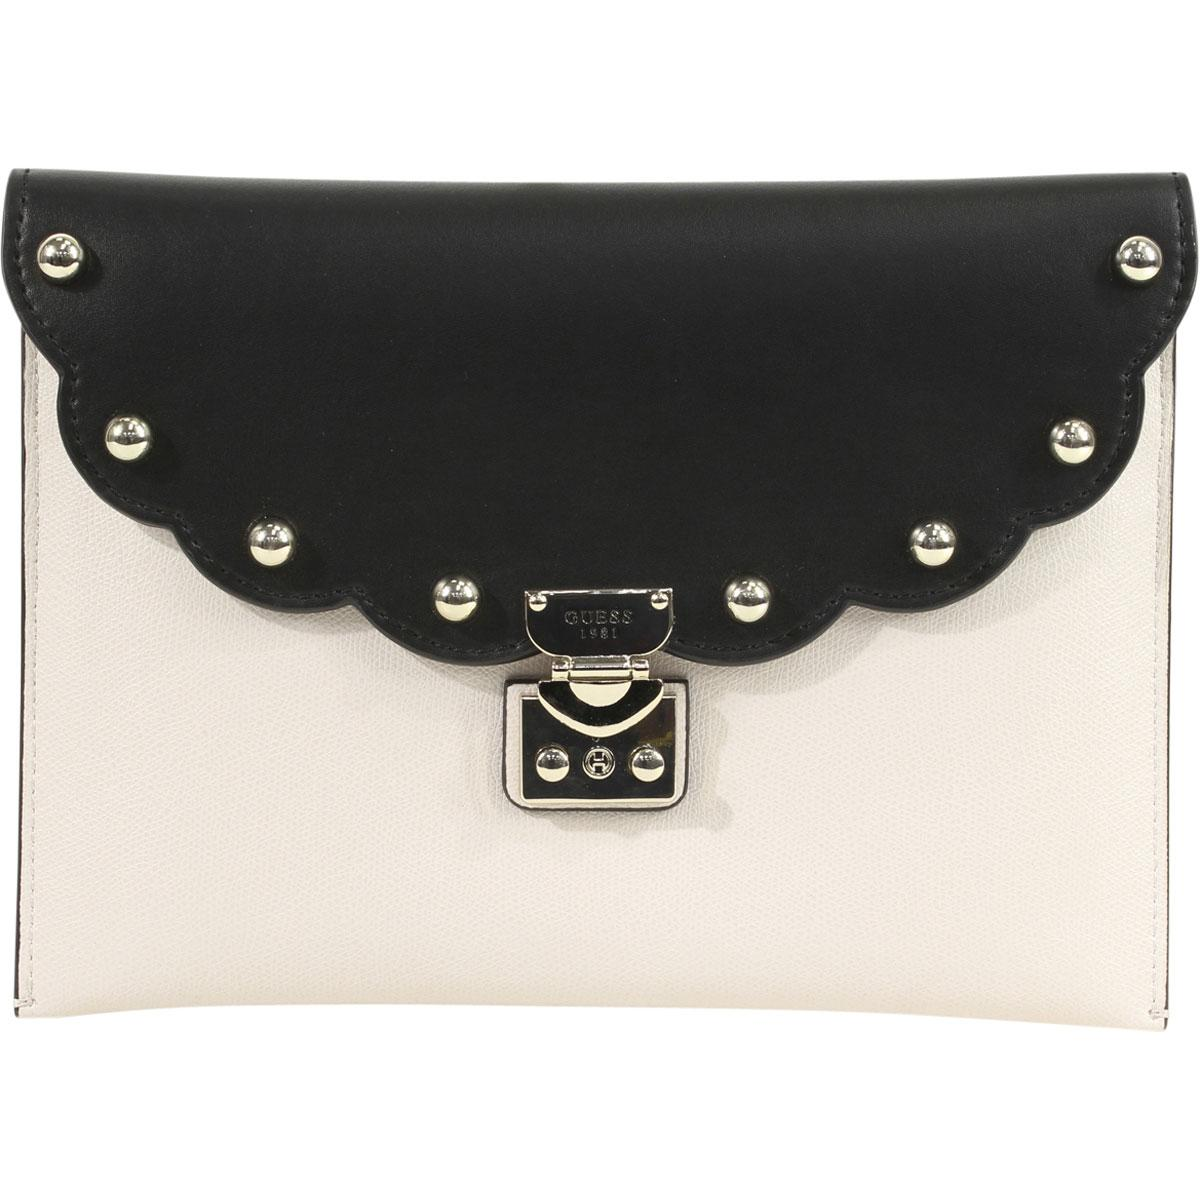 Guess Women's Fall In Love Mini Crossbody Clutch Handbag